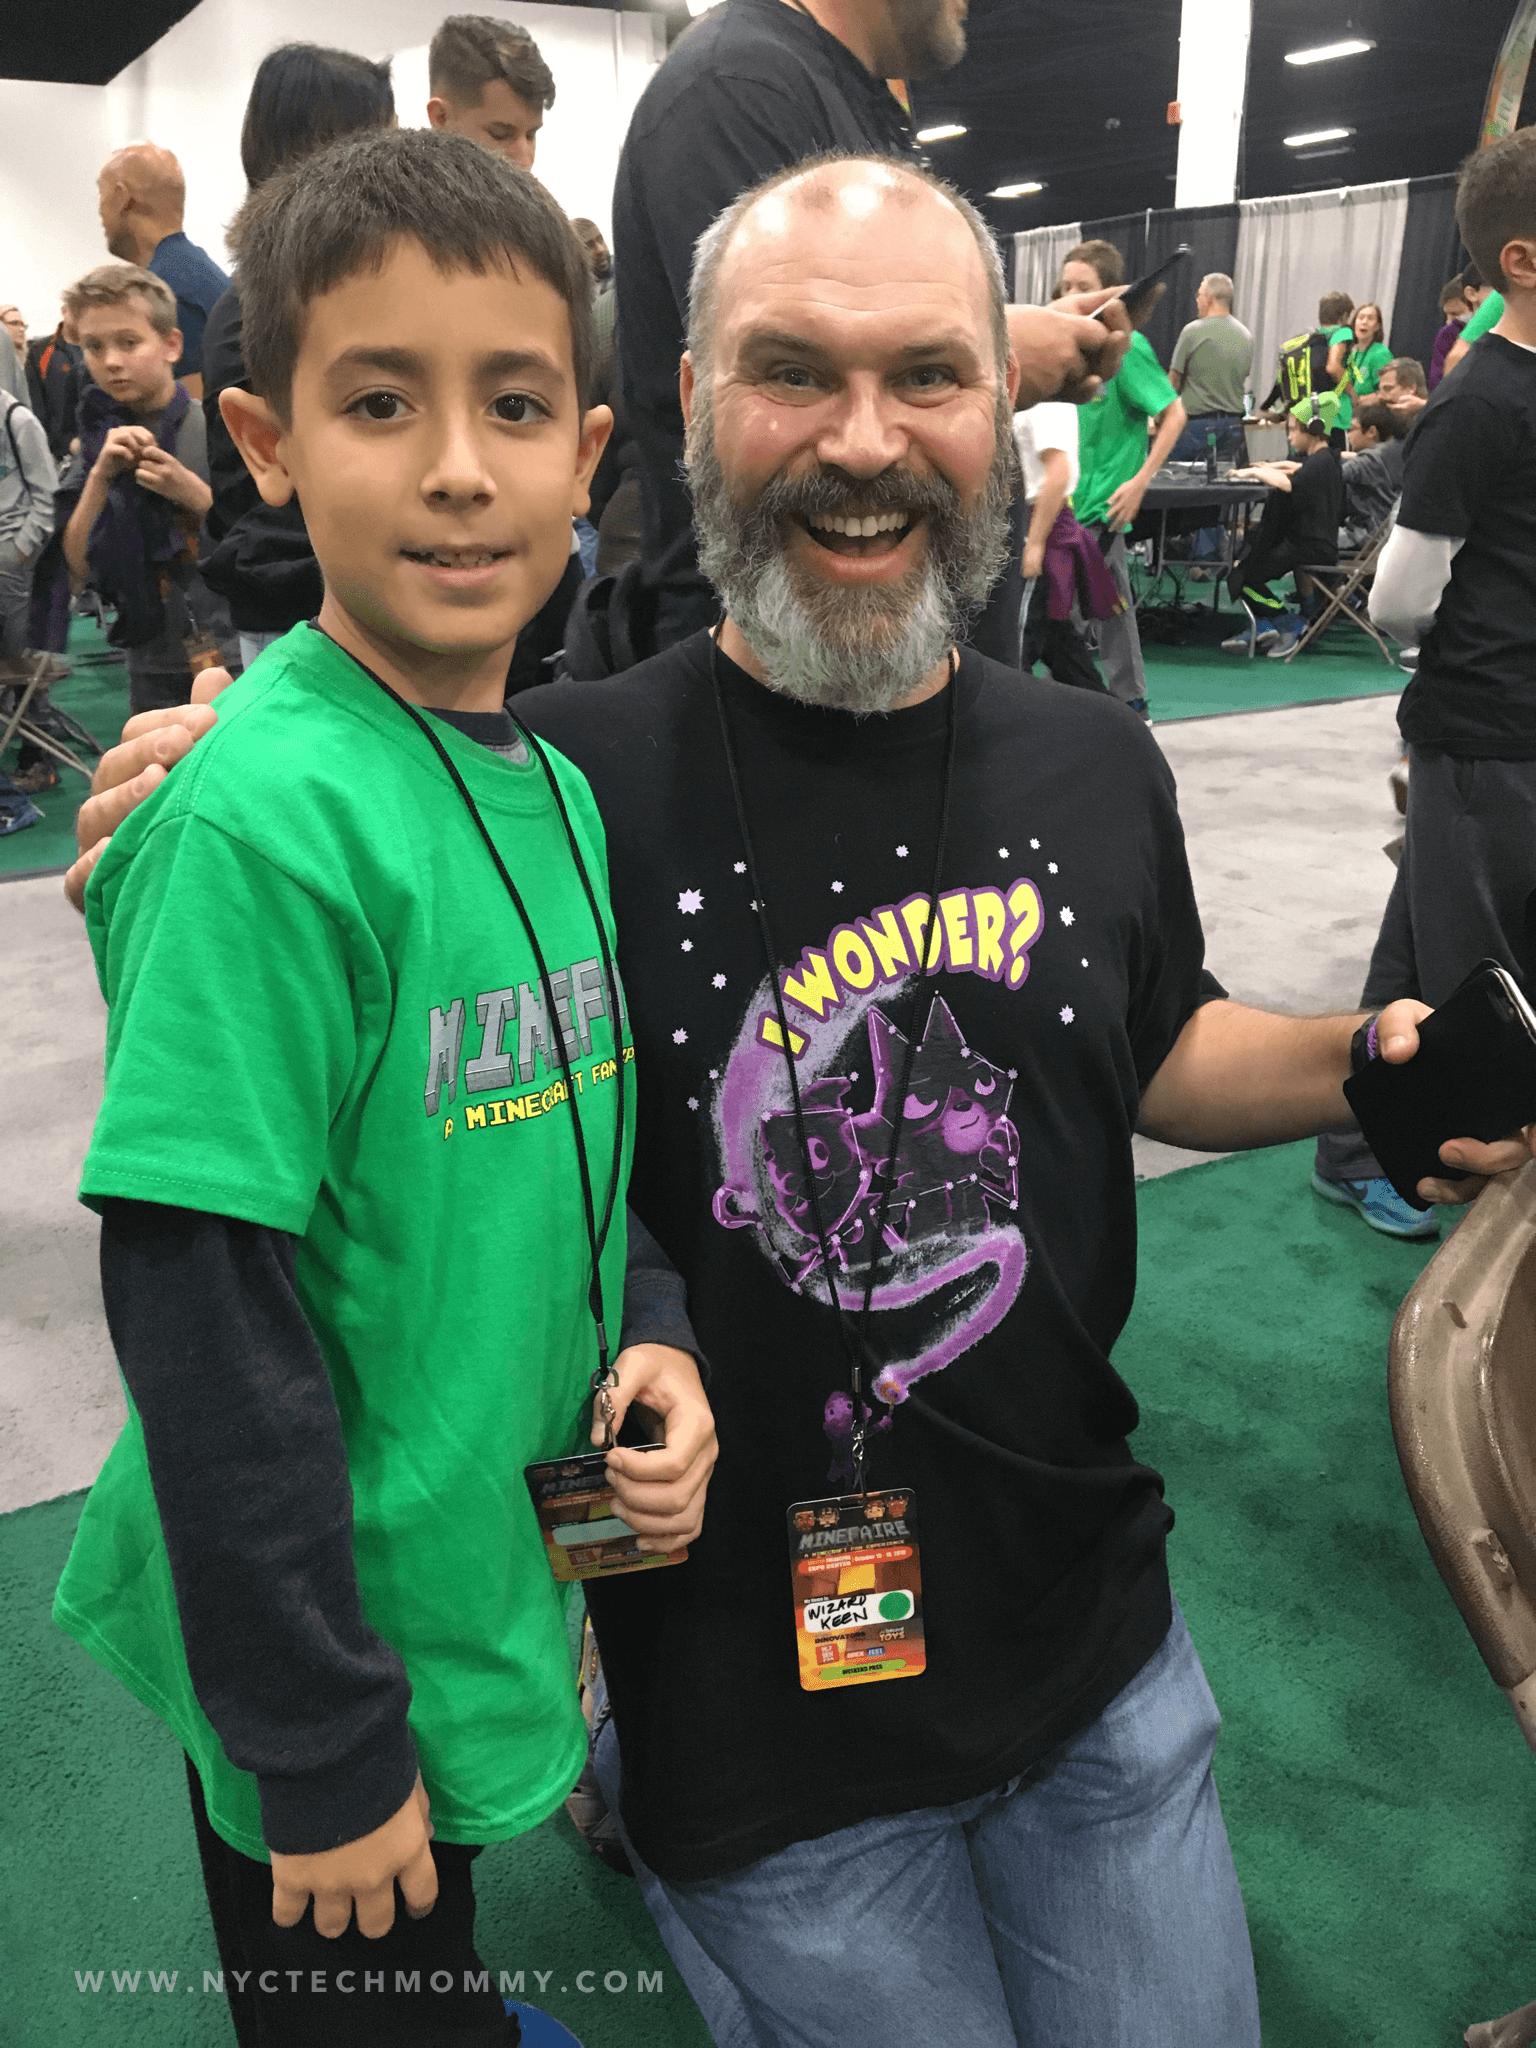 Meeting Wizard Keen at Minefaire